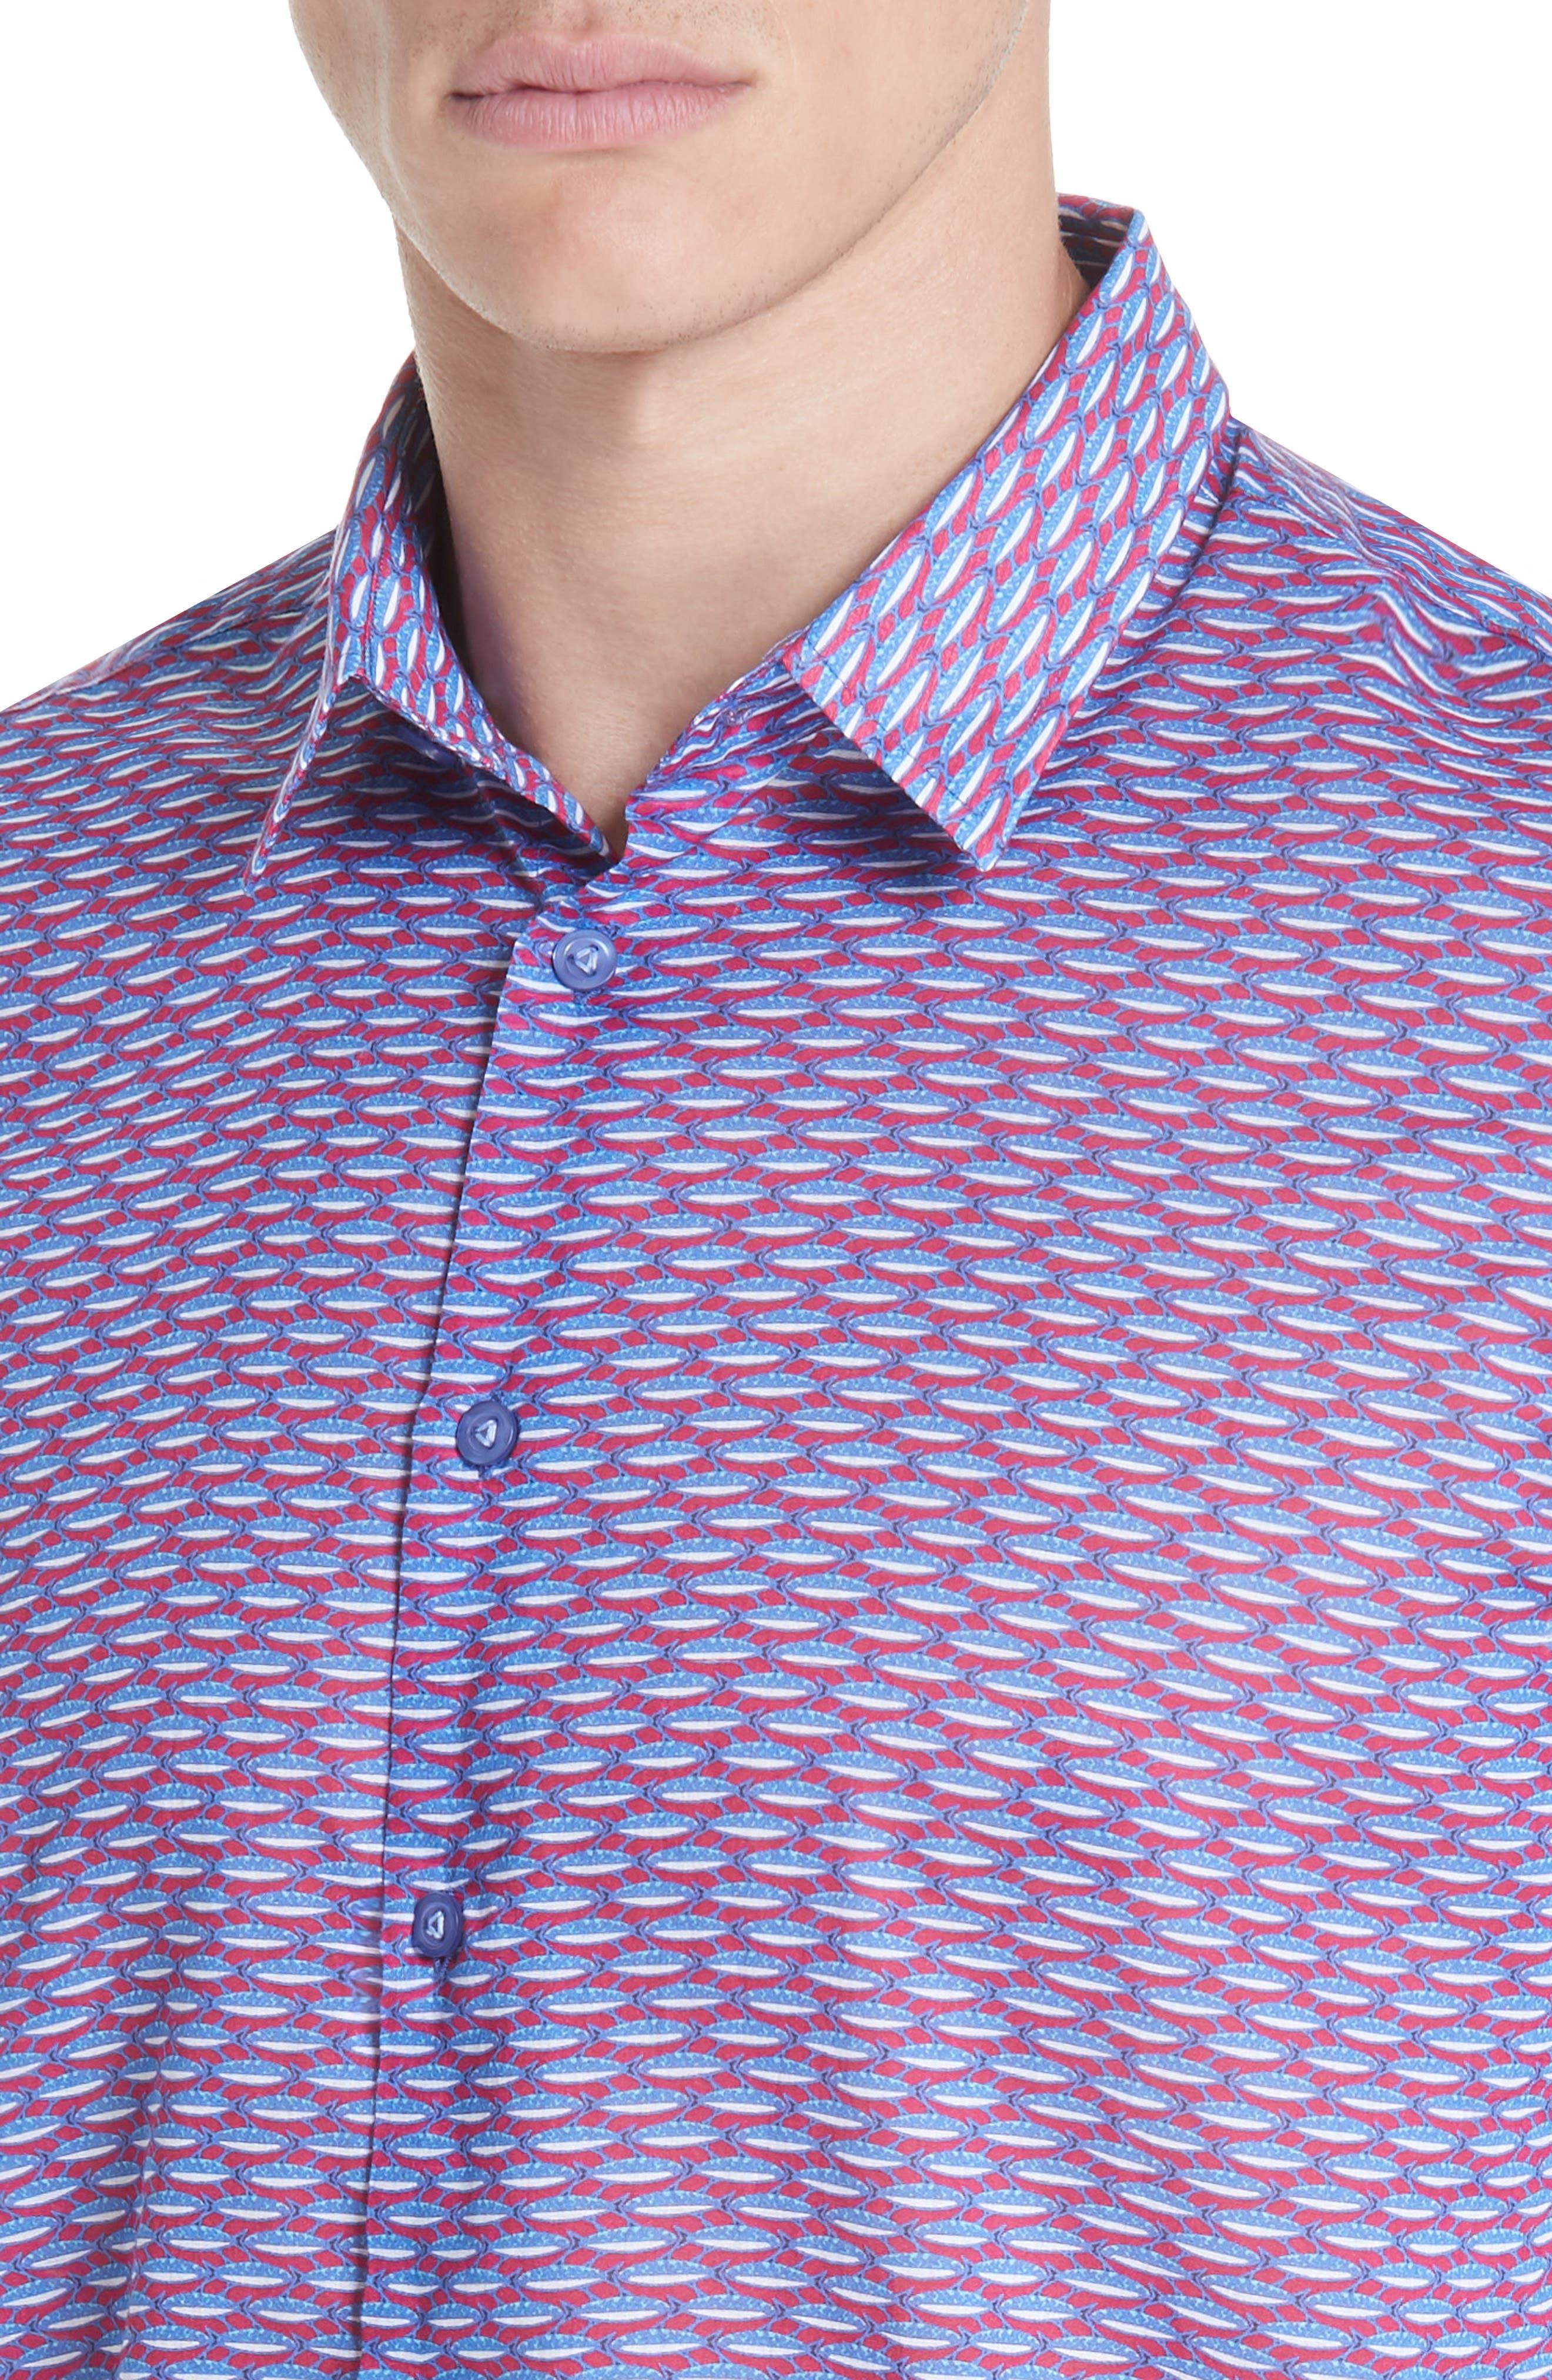 Marbella Voile Print Sport Shirt,                             Alternate thumbnail 2, color,                             MULTI